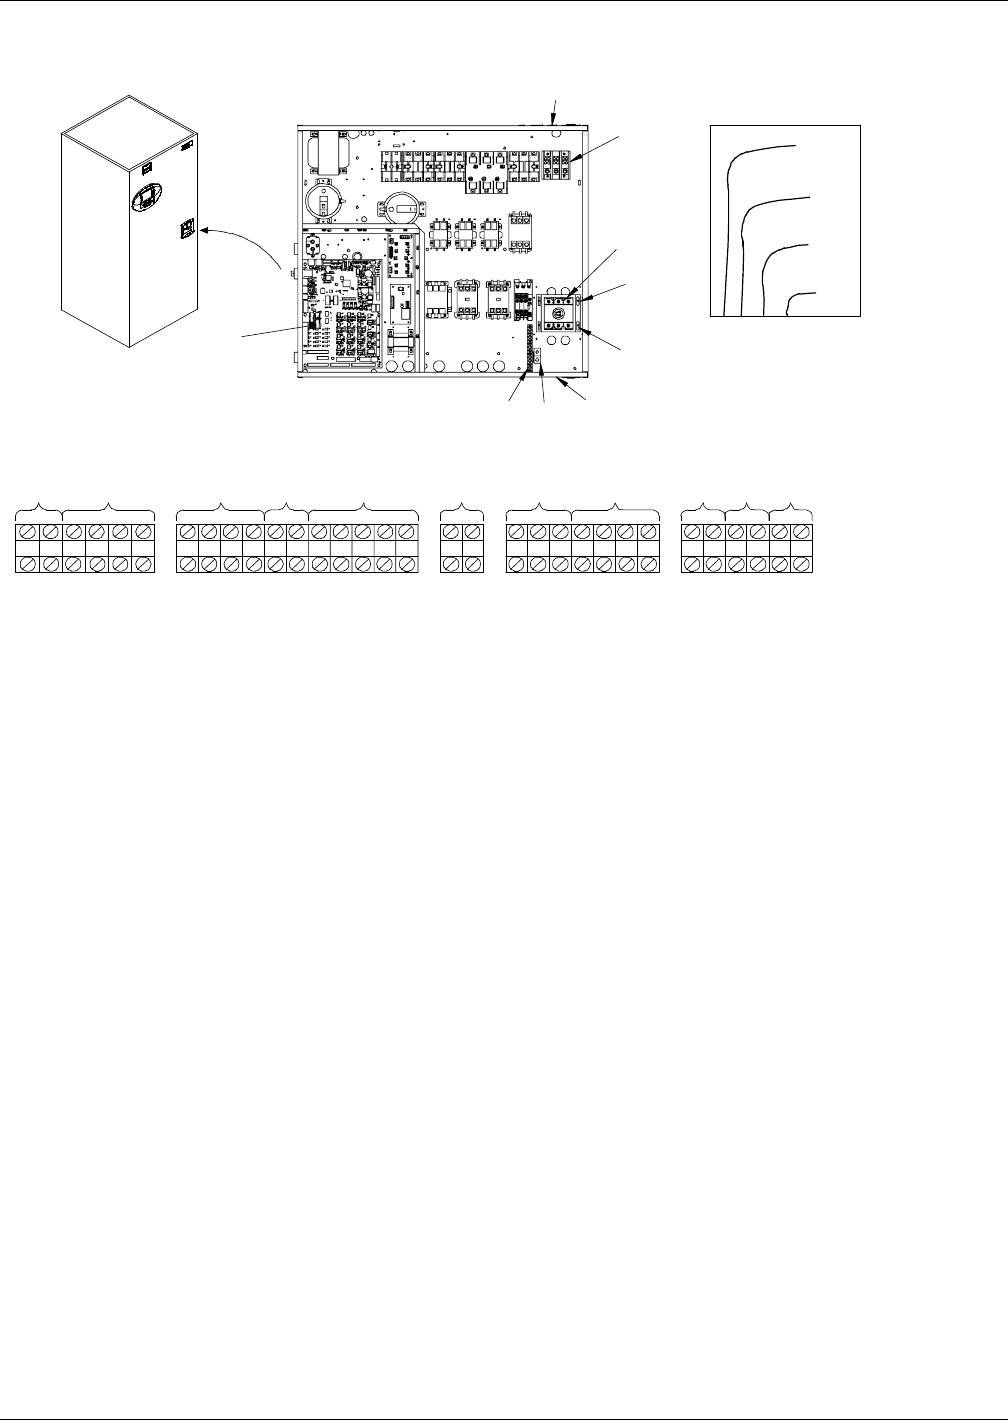 Emerson World Class 3000 Users Manual